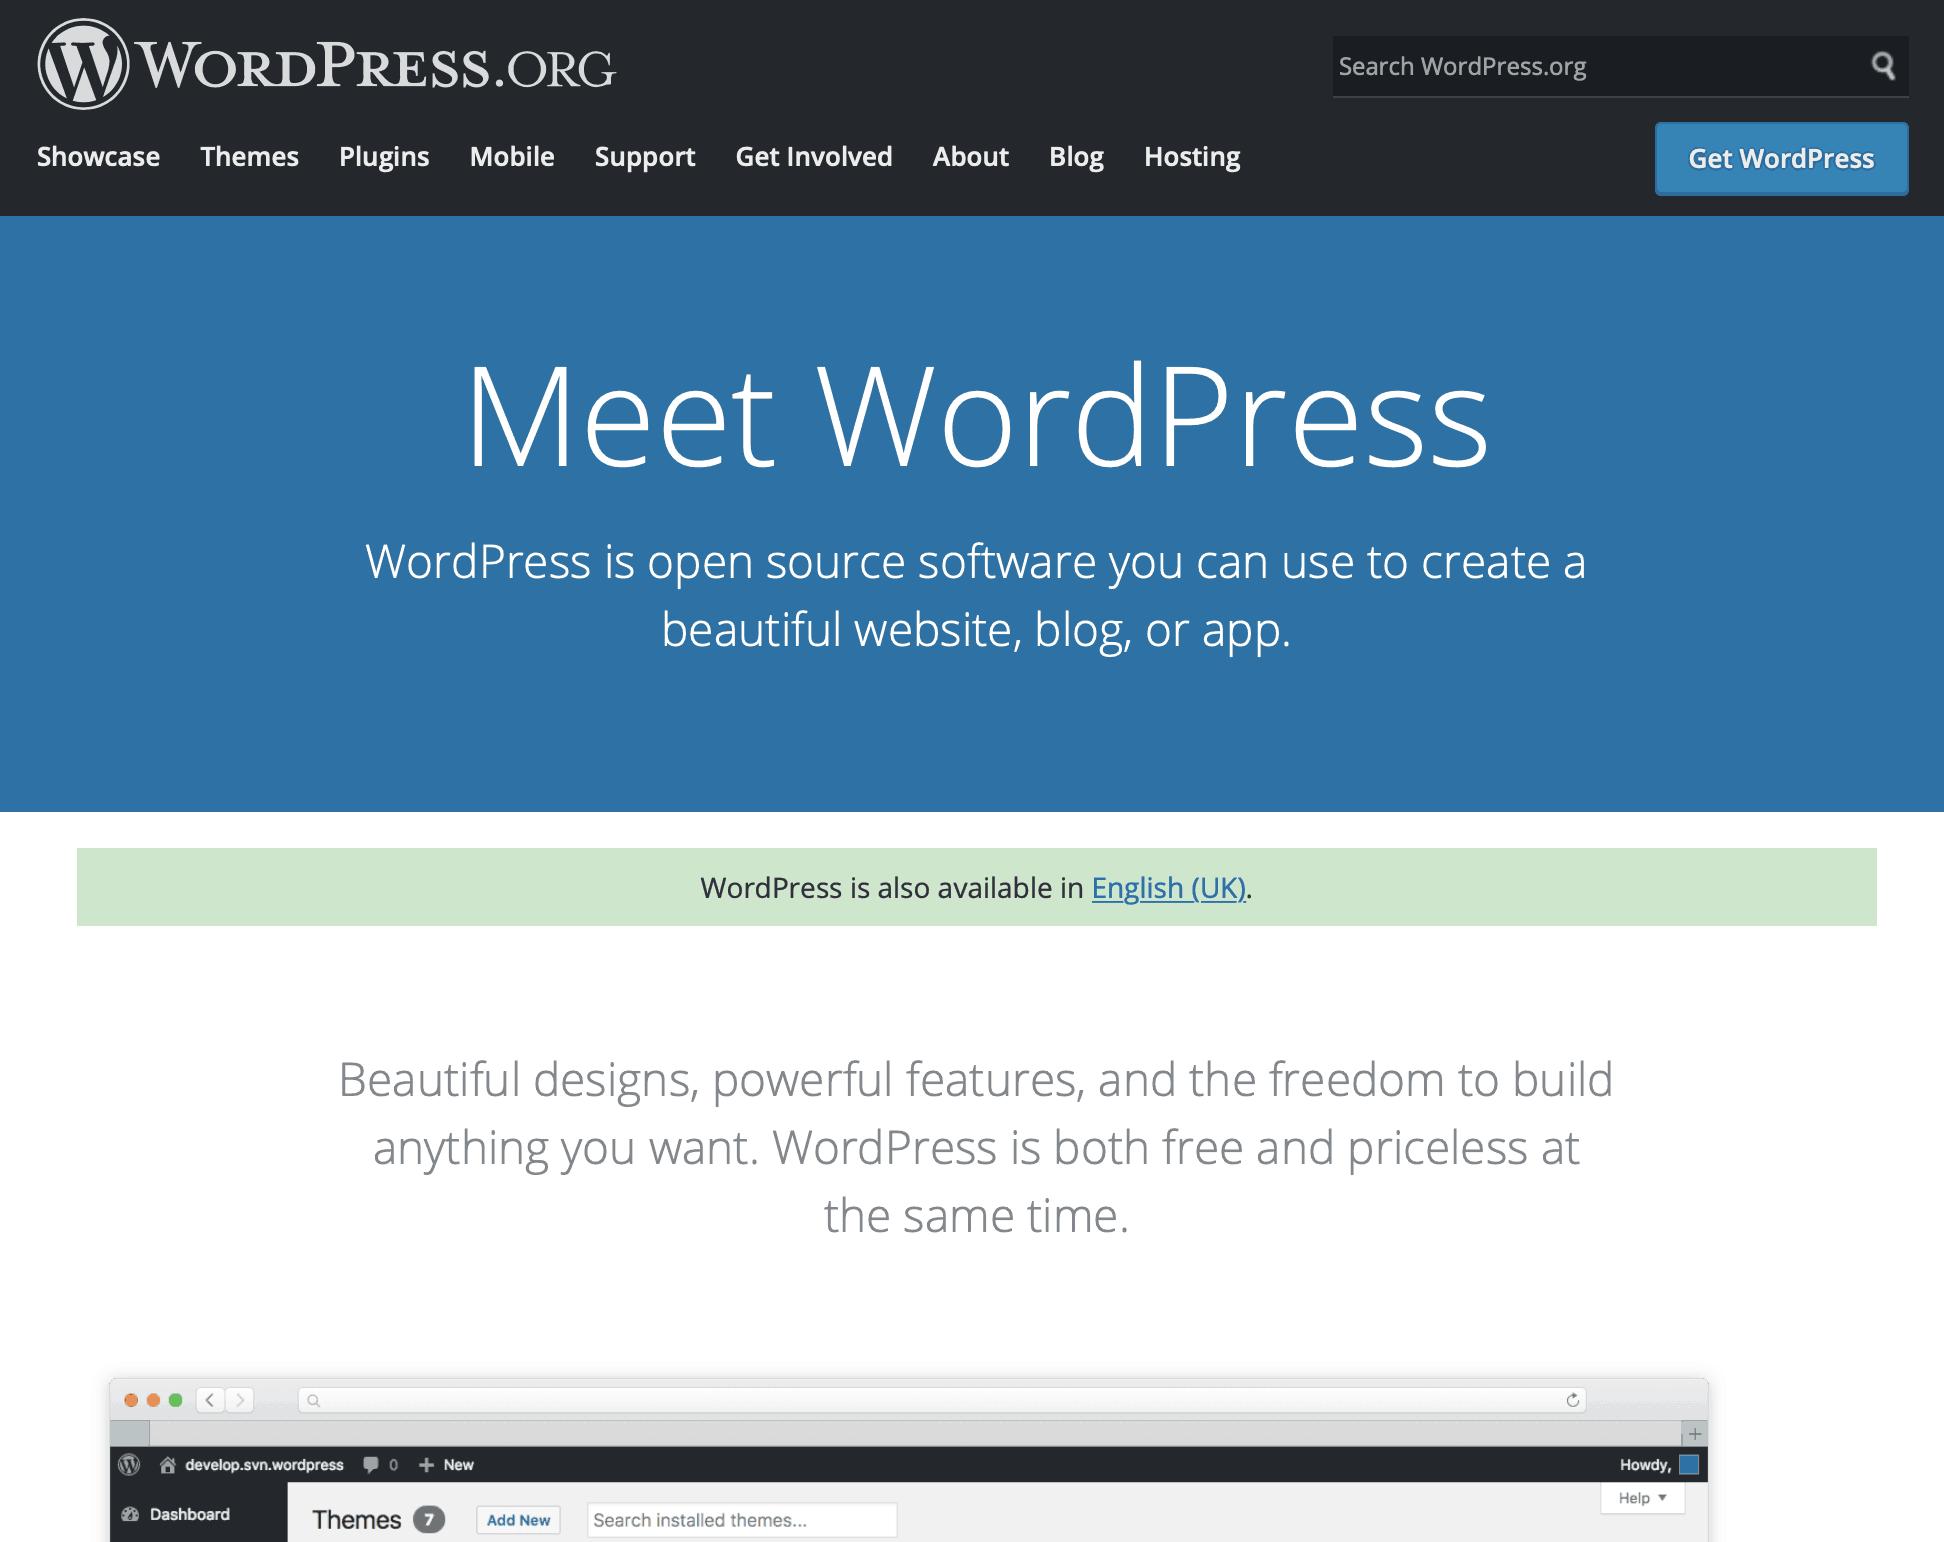 self hosted wordpress vs wordpress.com wordpress.org